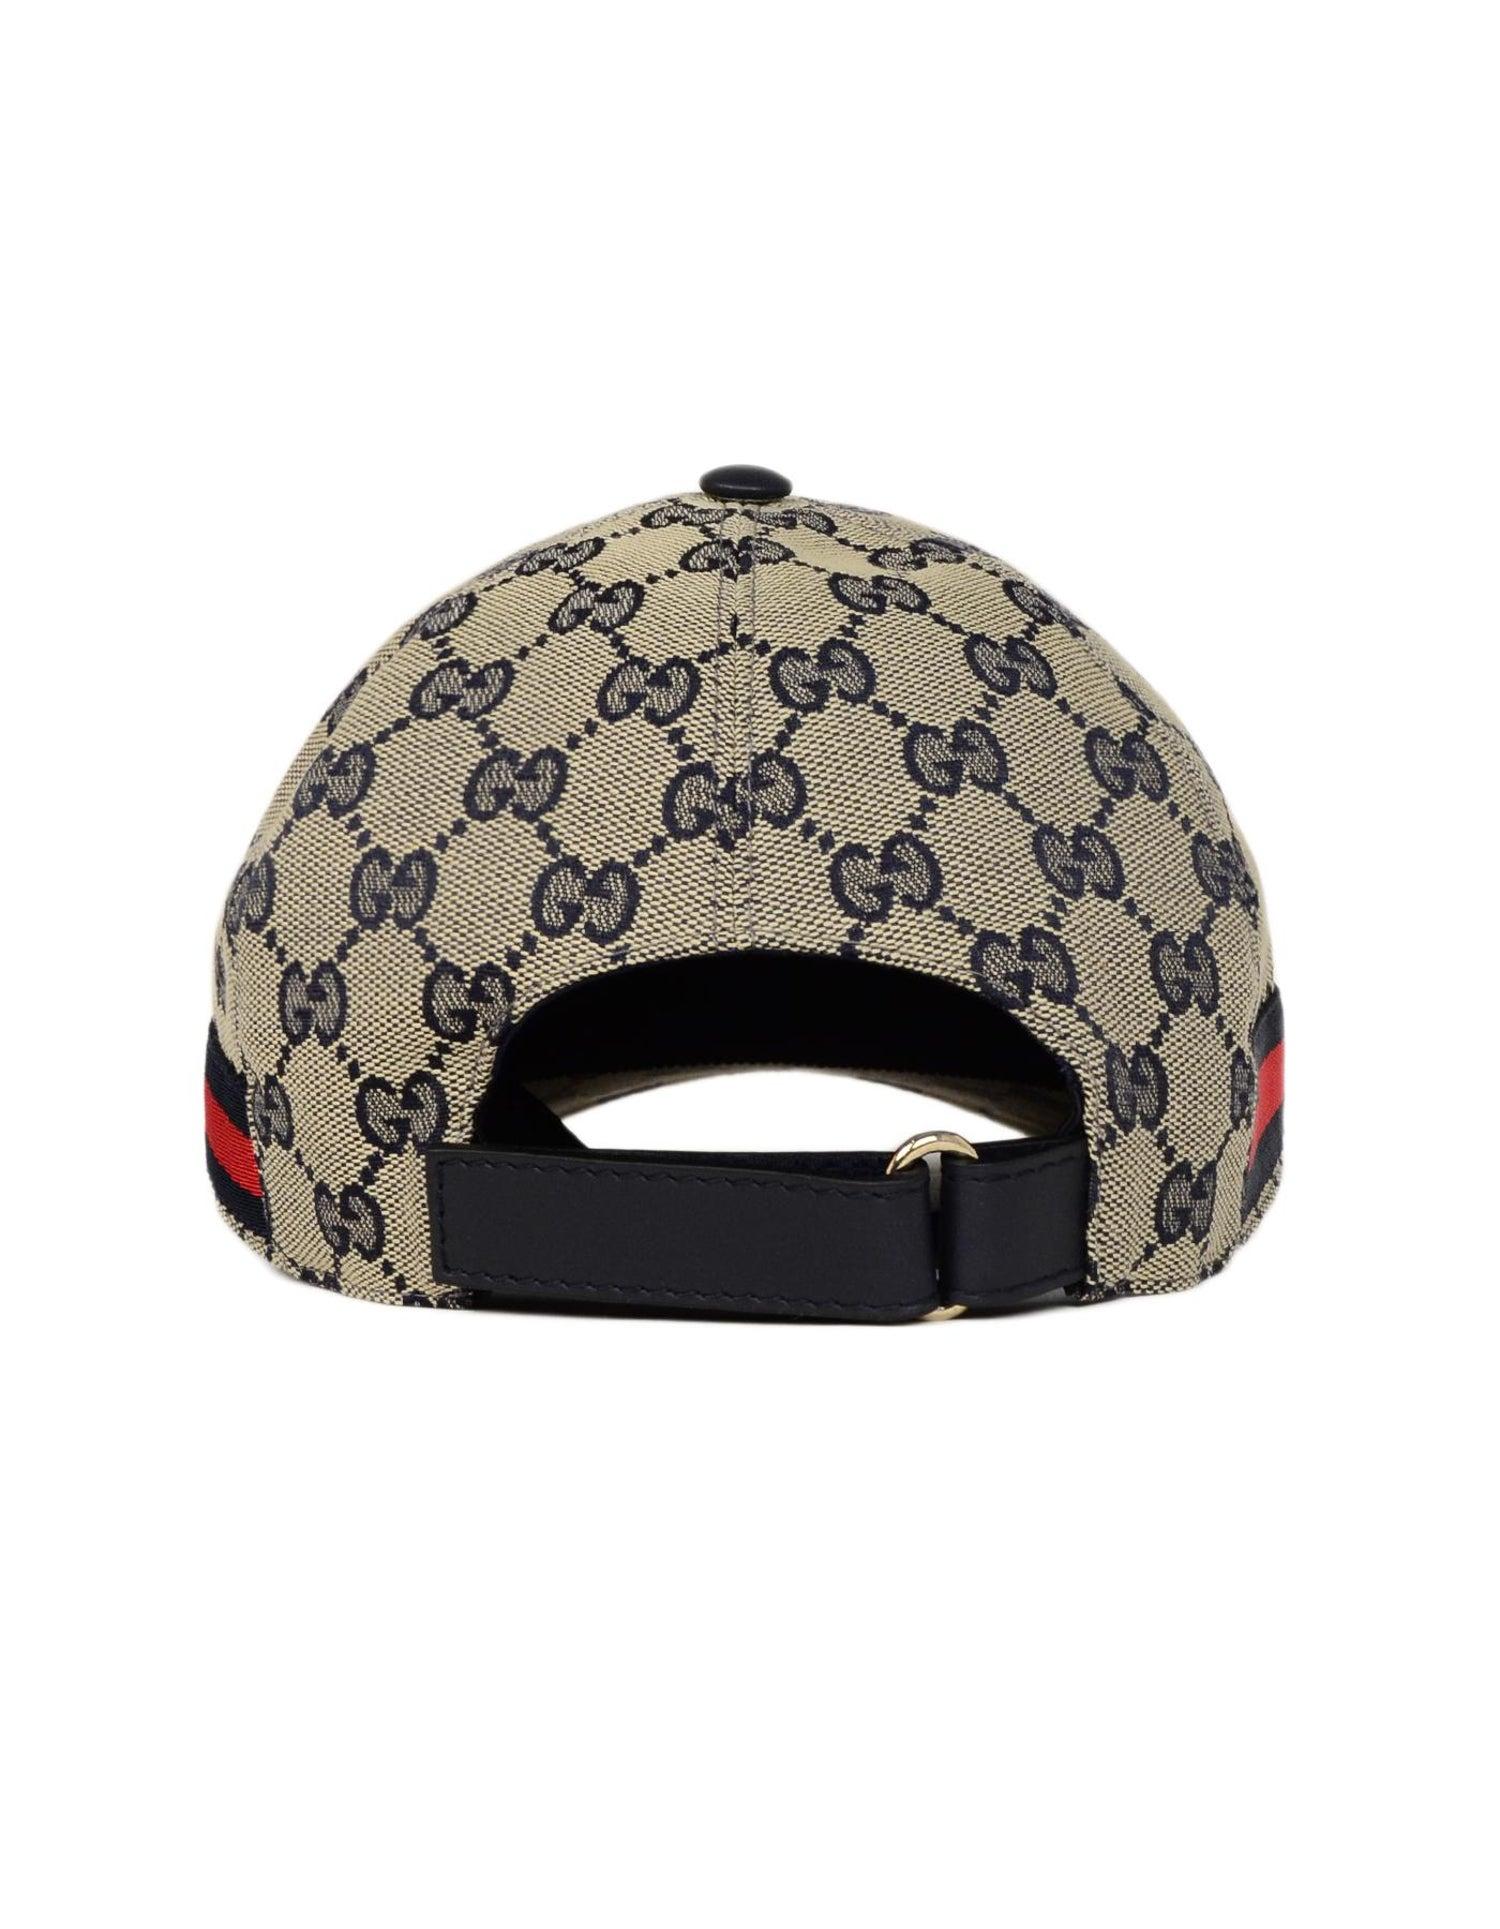 f157f28e6cc27 Gucci NWT Navy Monogram Original GG Canvas Baseball Cap Hat W  Web Unisex  Sz M For Sale at 1stdibs